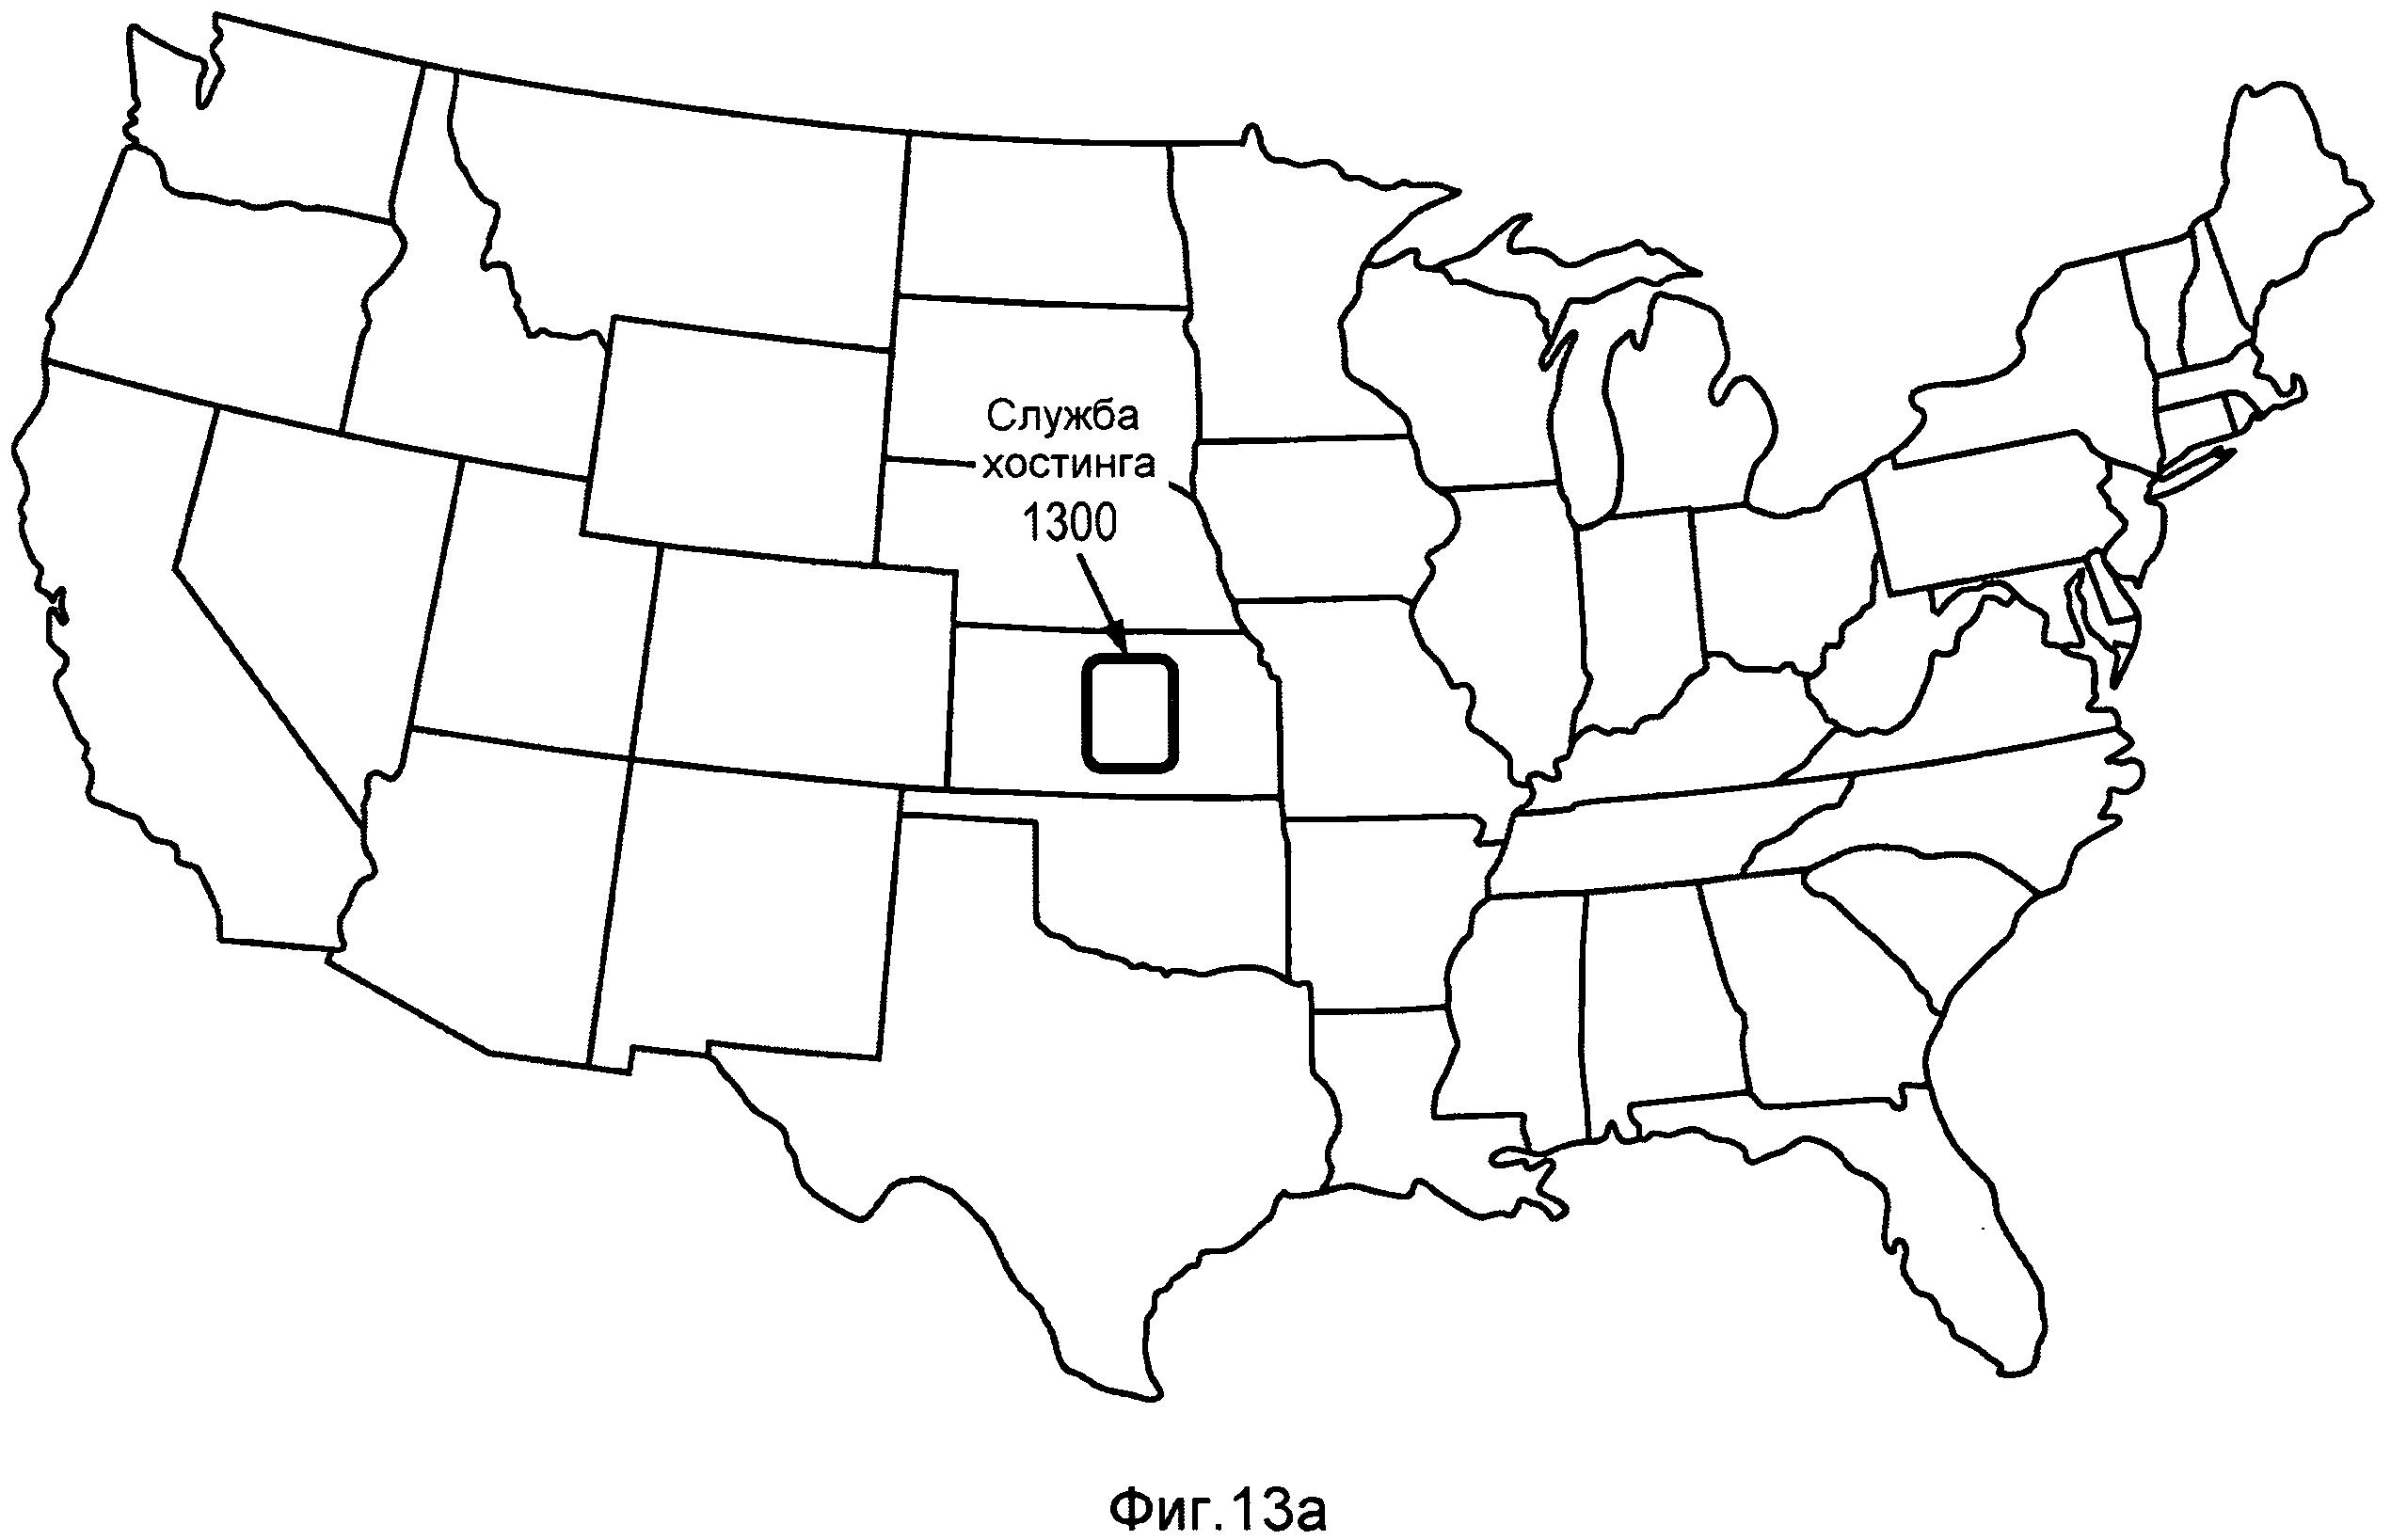 сша карта штатов картинки теория дарвина